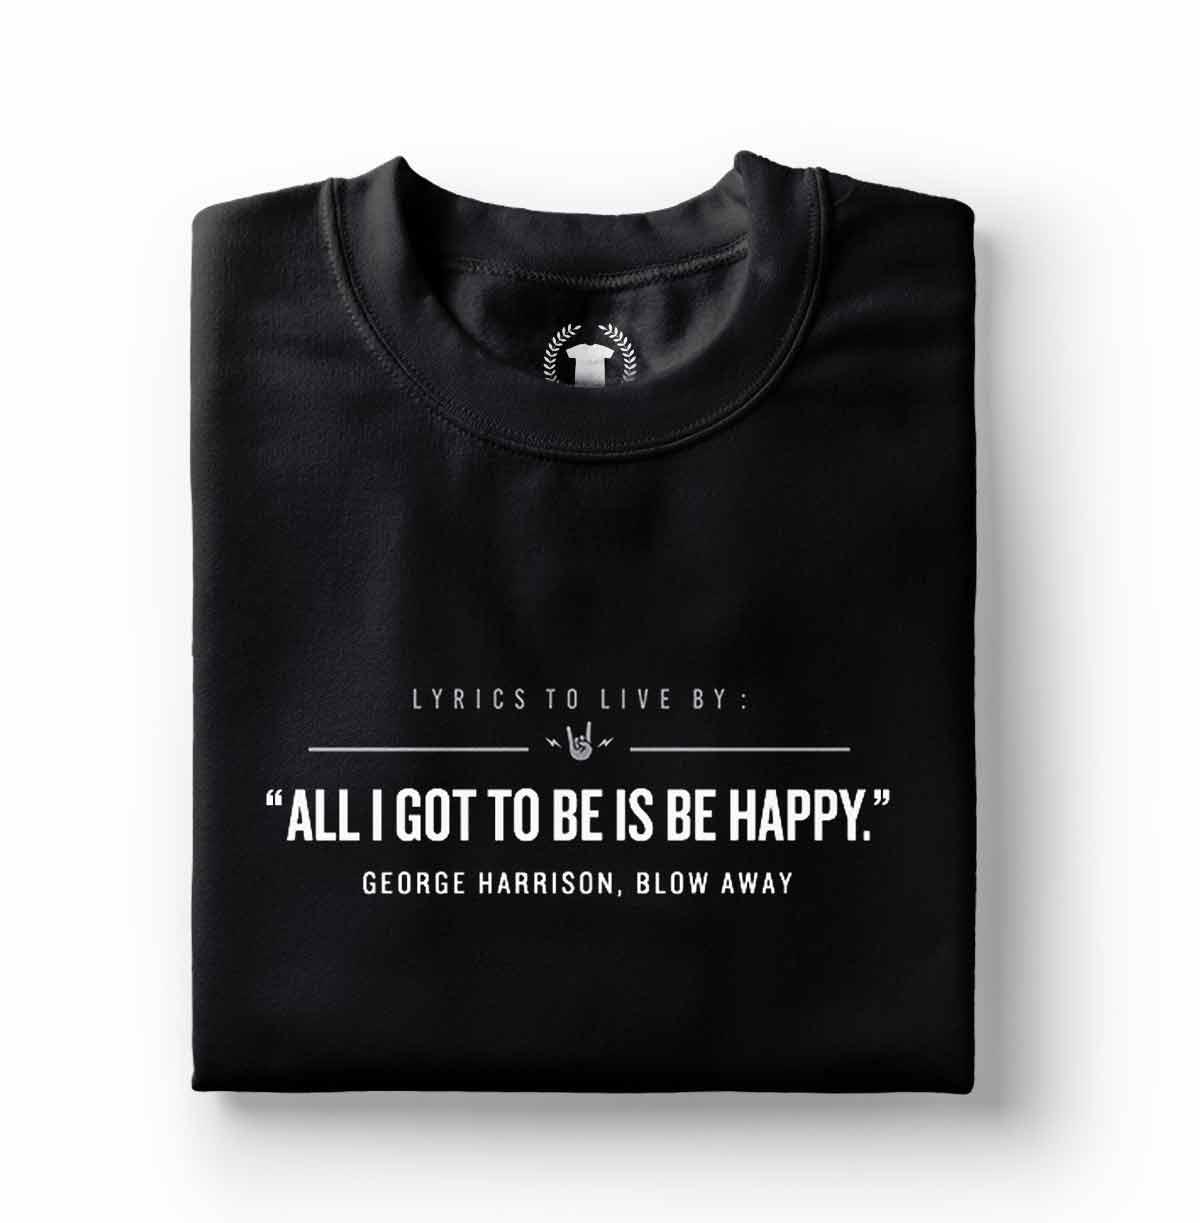 camiseta george harrison blow away